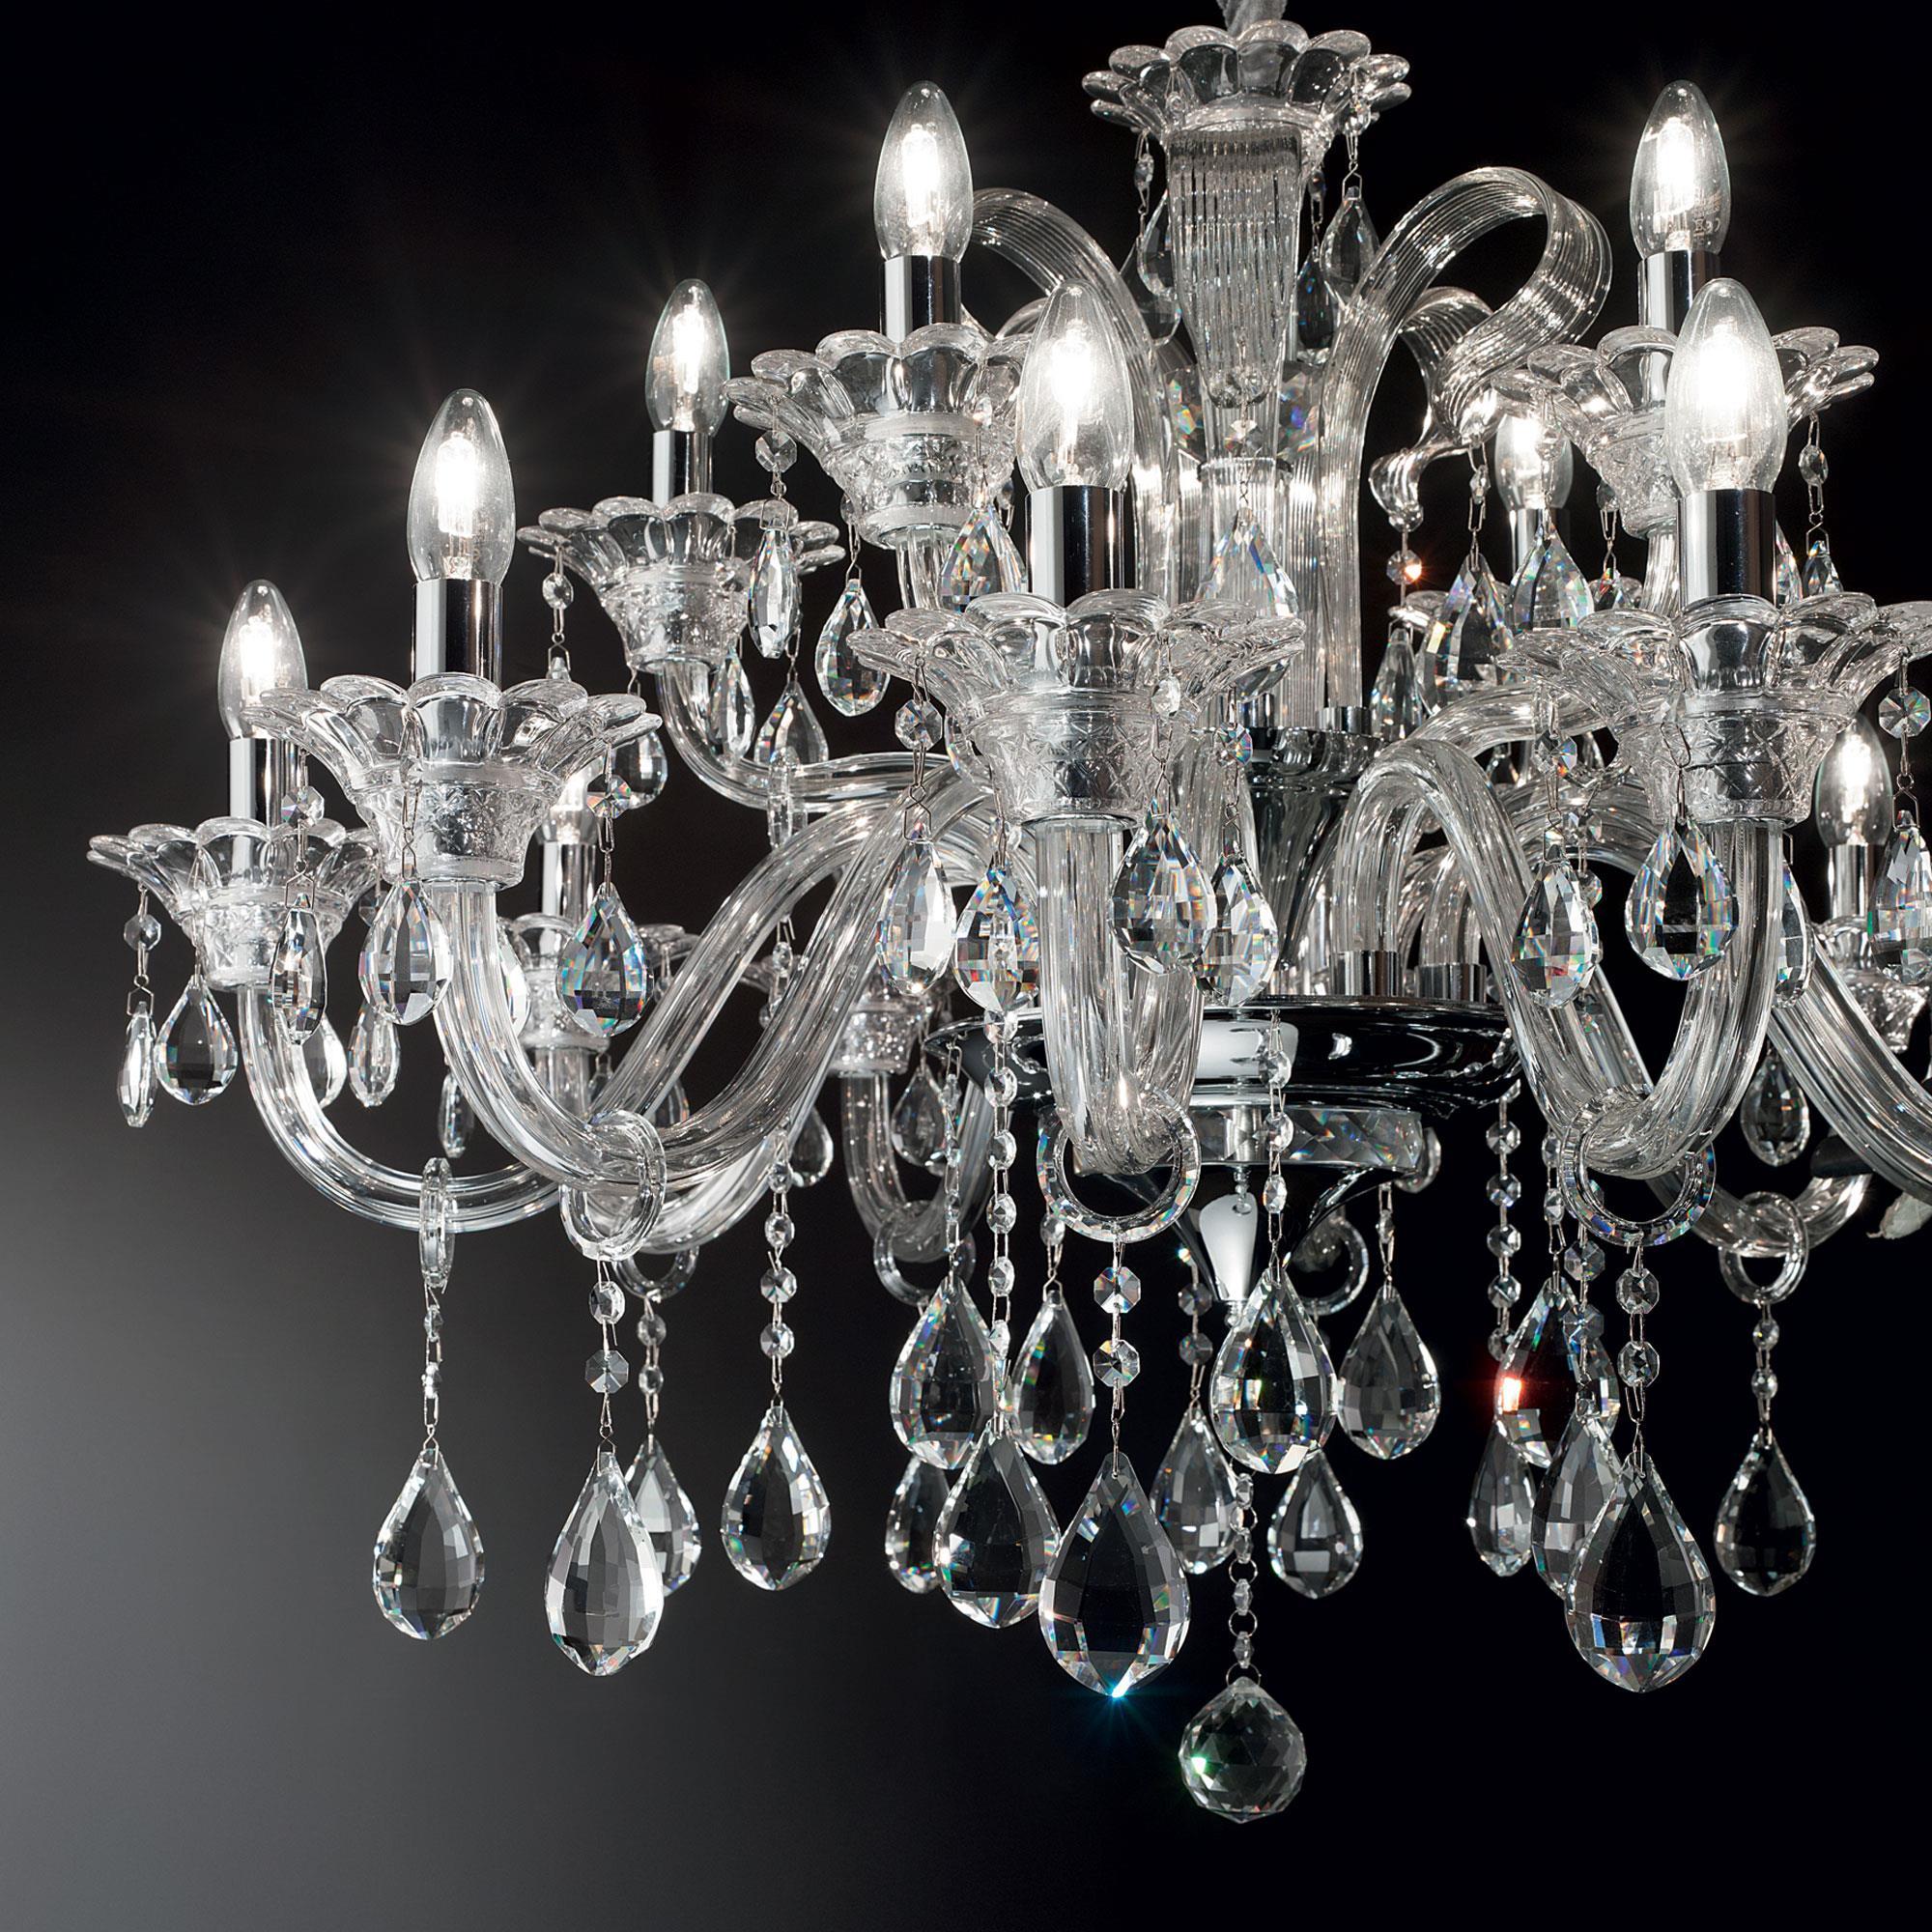 Ideal Lux 114170 Colossal SP15 Trasparente kristálycsillár